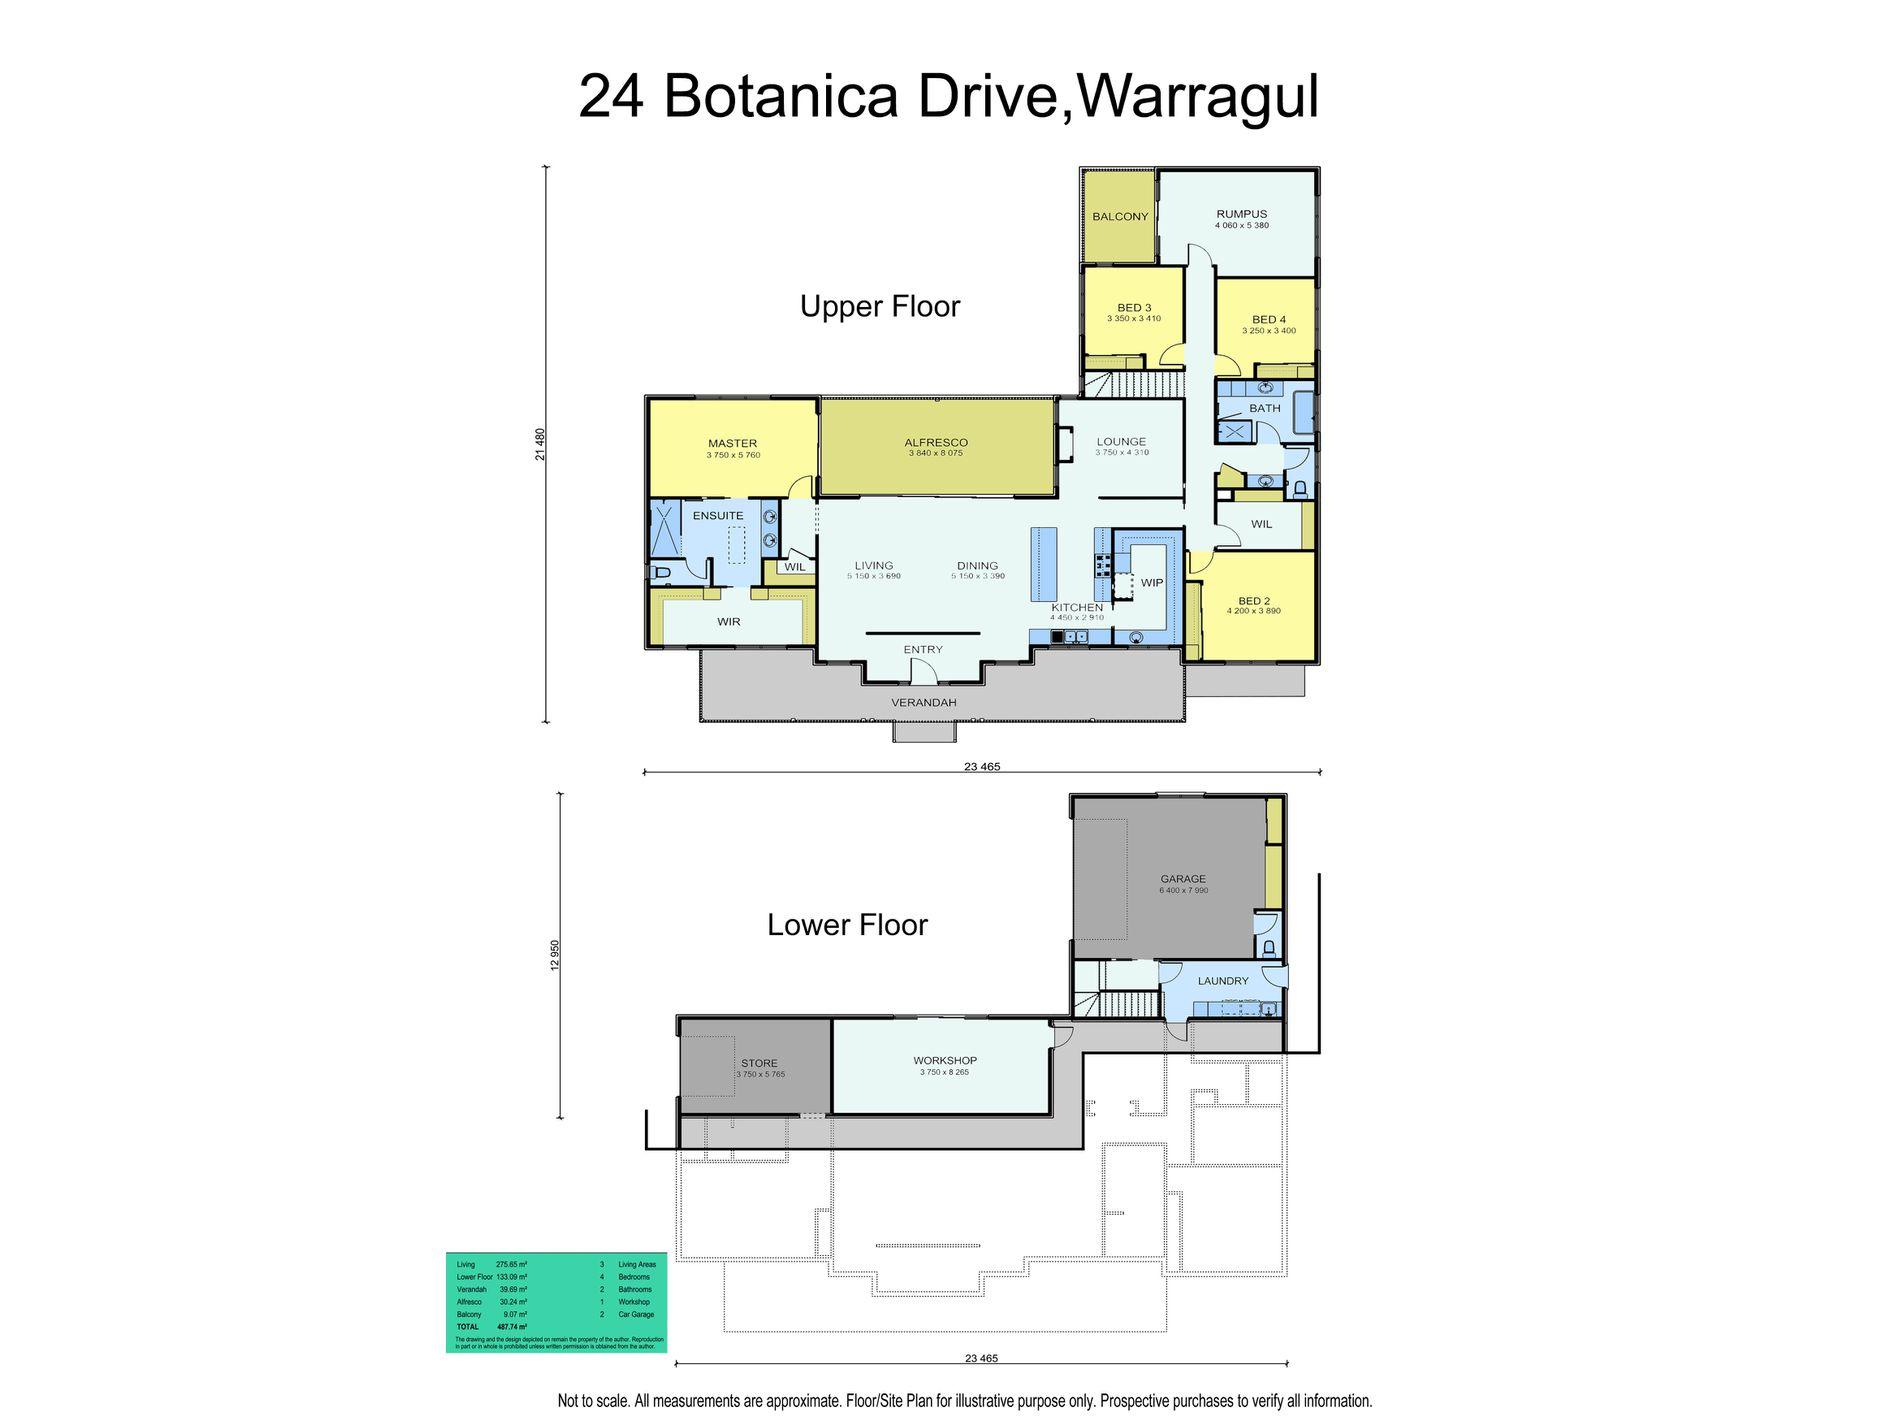 24 Botanica Drive, Warragul